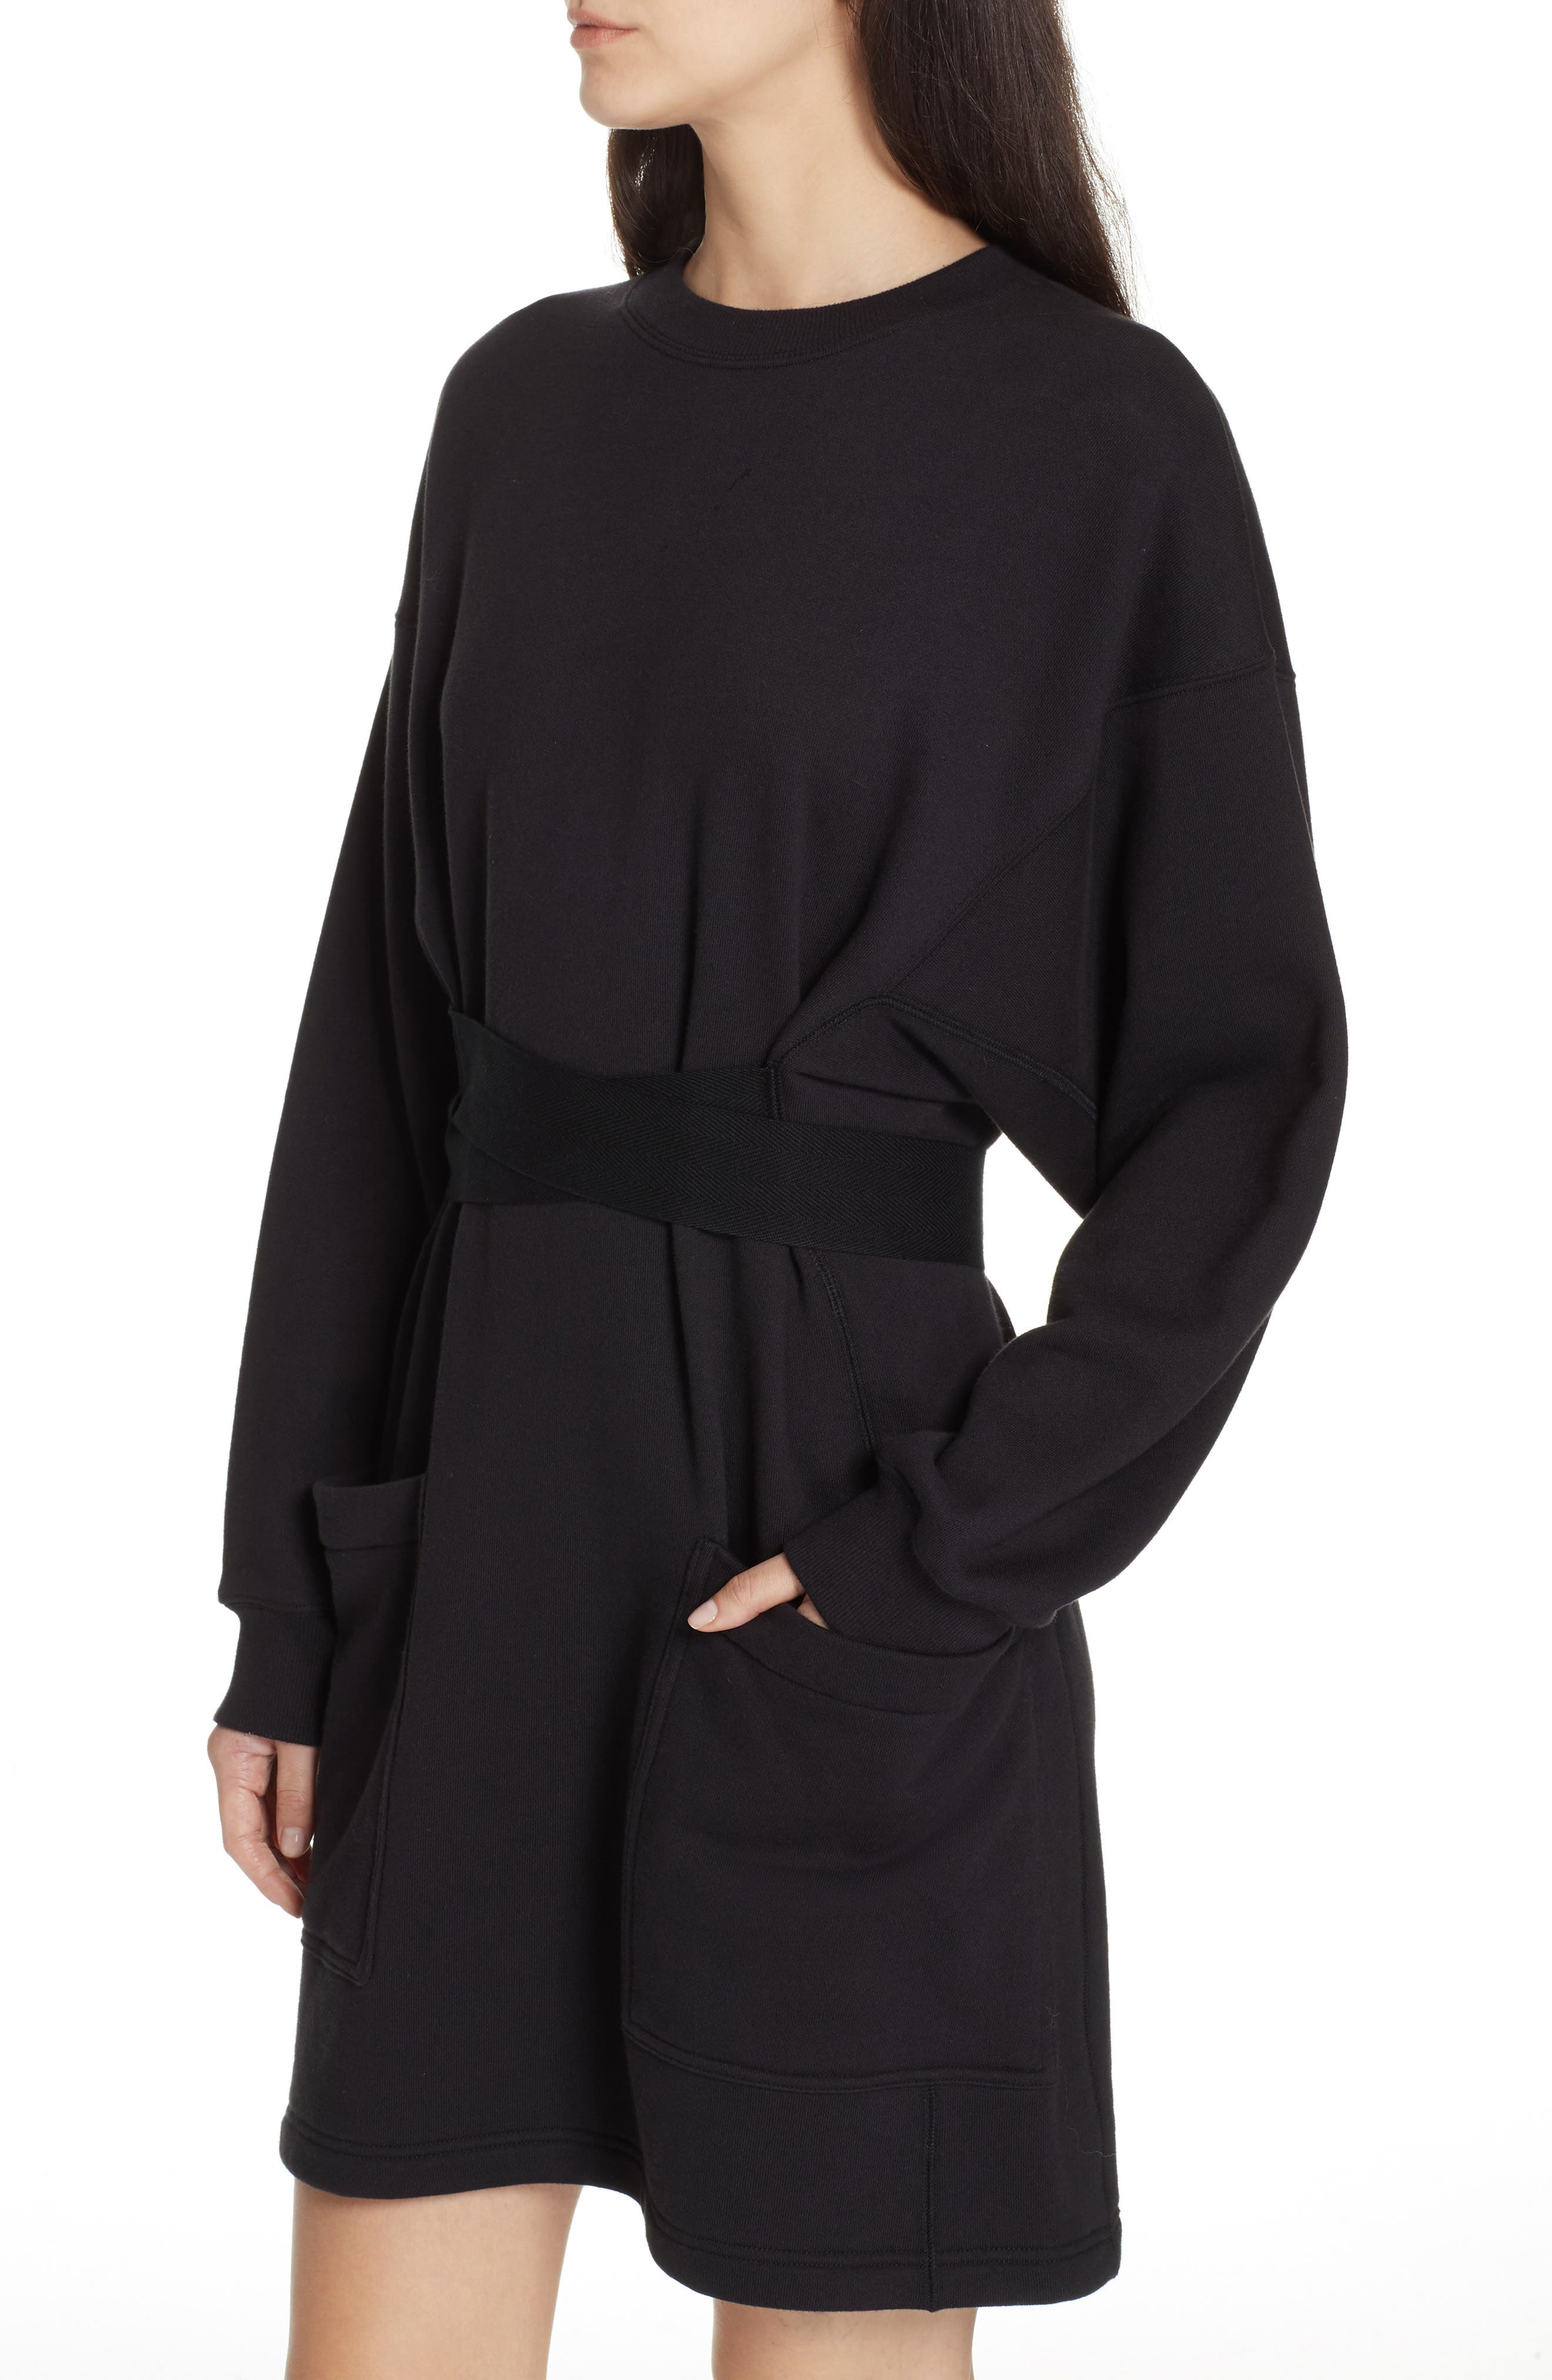 PSWL Belted Sweatshirt Dress,                             Alternate thumbnail 4, color,                             BLACK